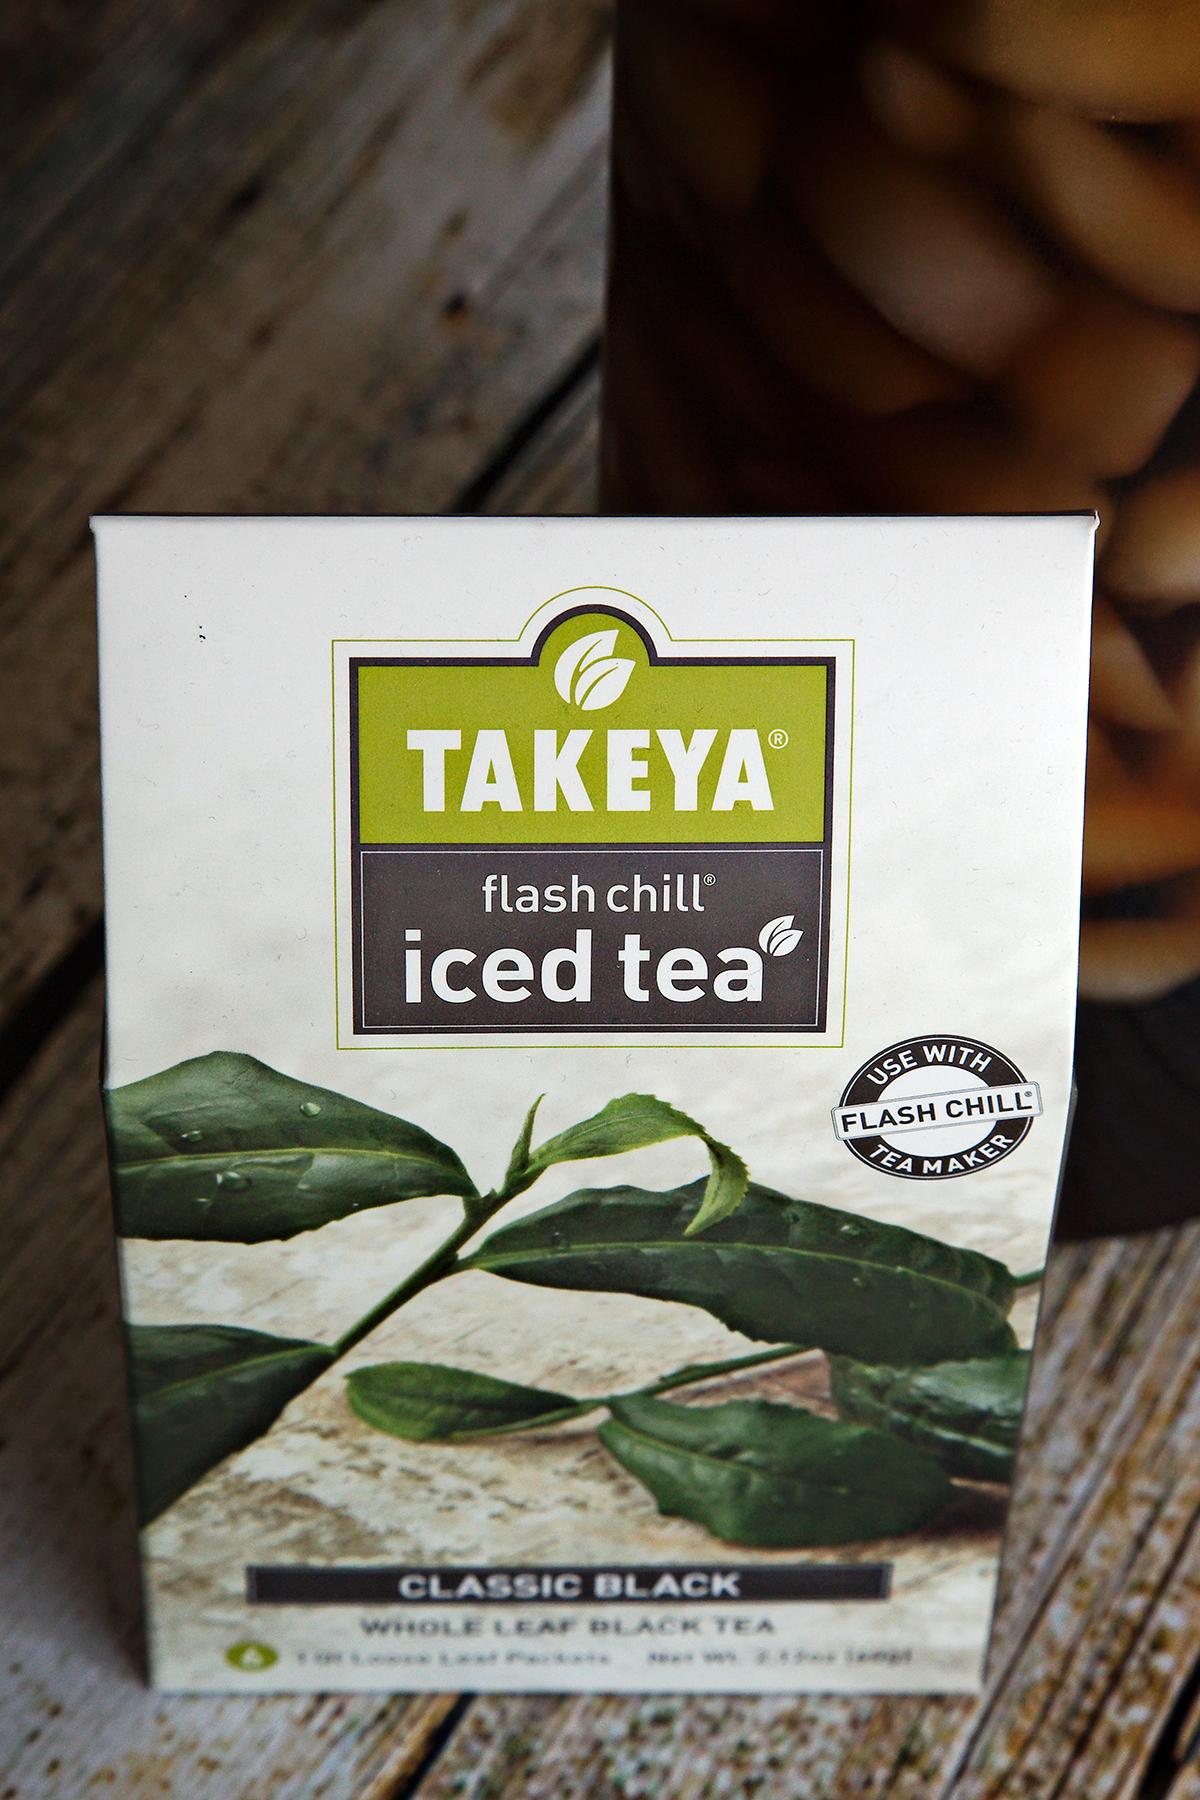 Flash Chill Classic Black Whole Leaf Iced Tea